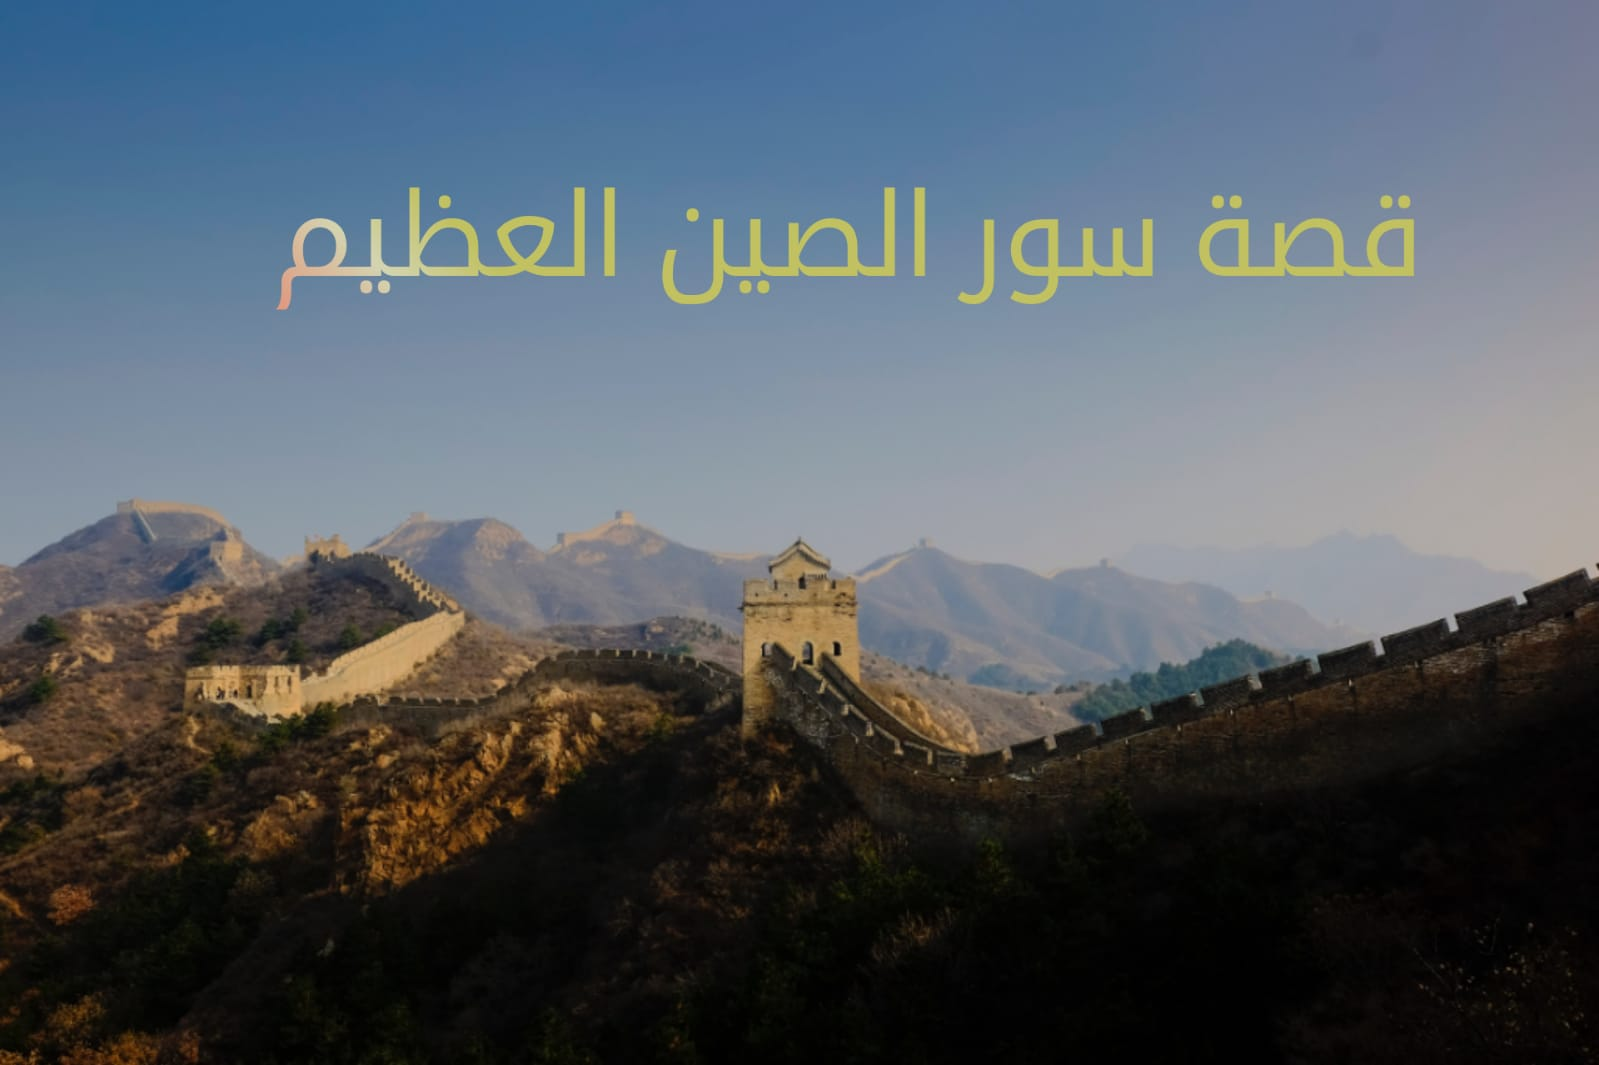 WhatsApp Image 2020 06 09 at 11.29.50 AM - قصة حزينة عن سور الصين العظيم